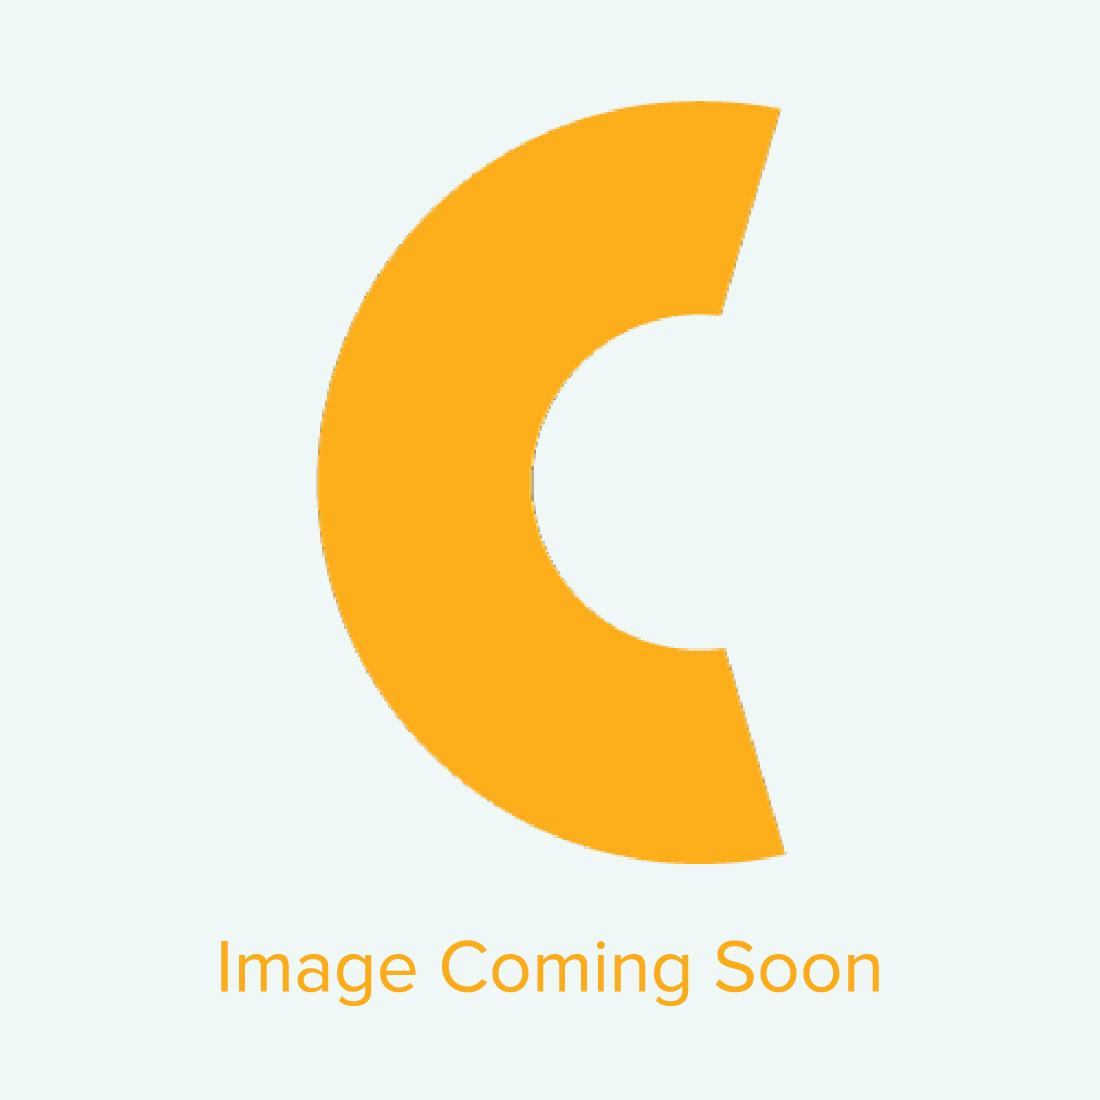 "Mahogany Sublimation Desk Name Plate Plaque - 1.68"" x 9.375"""